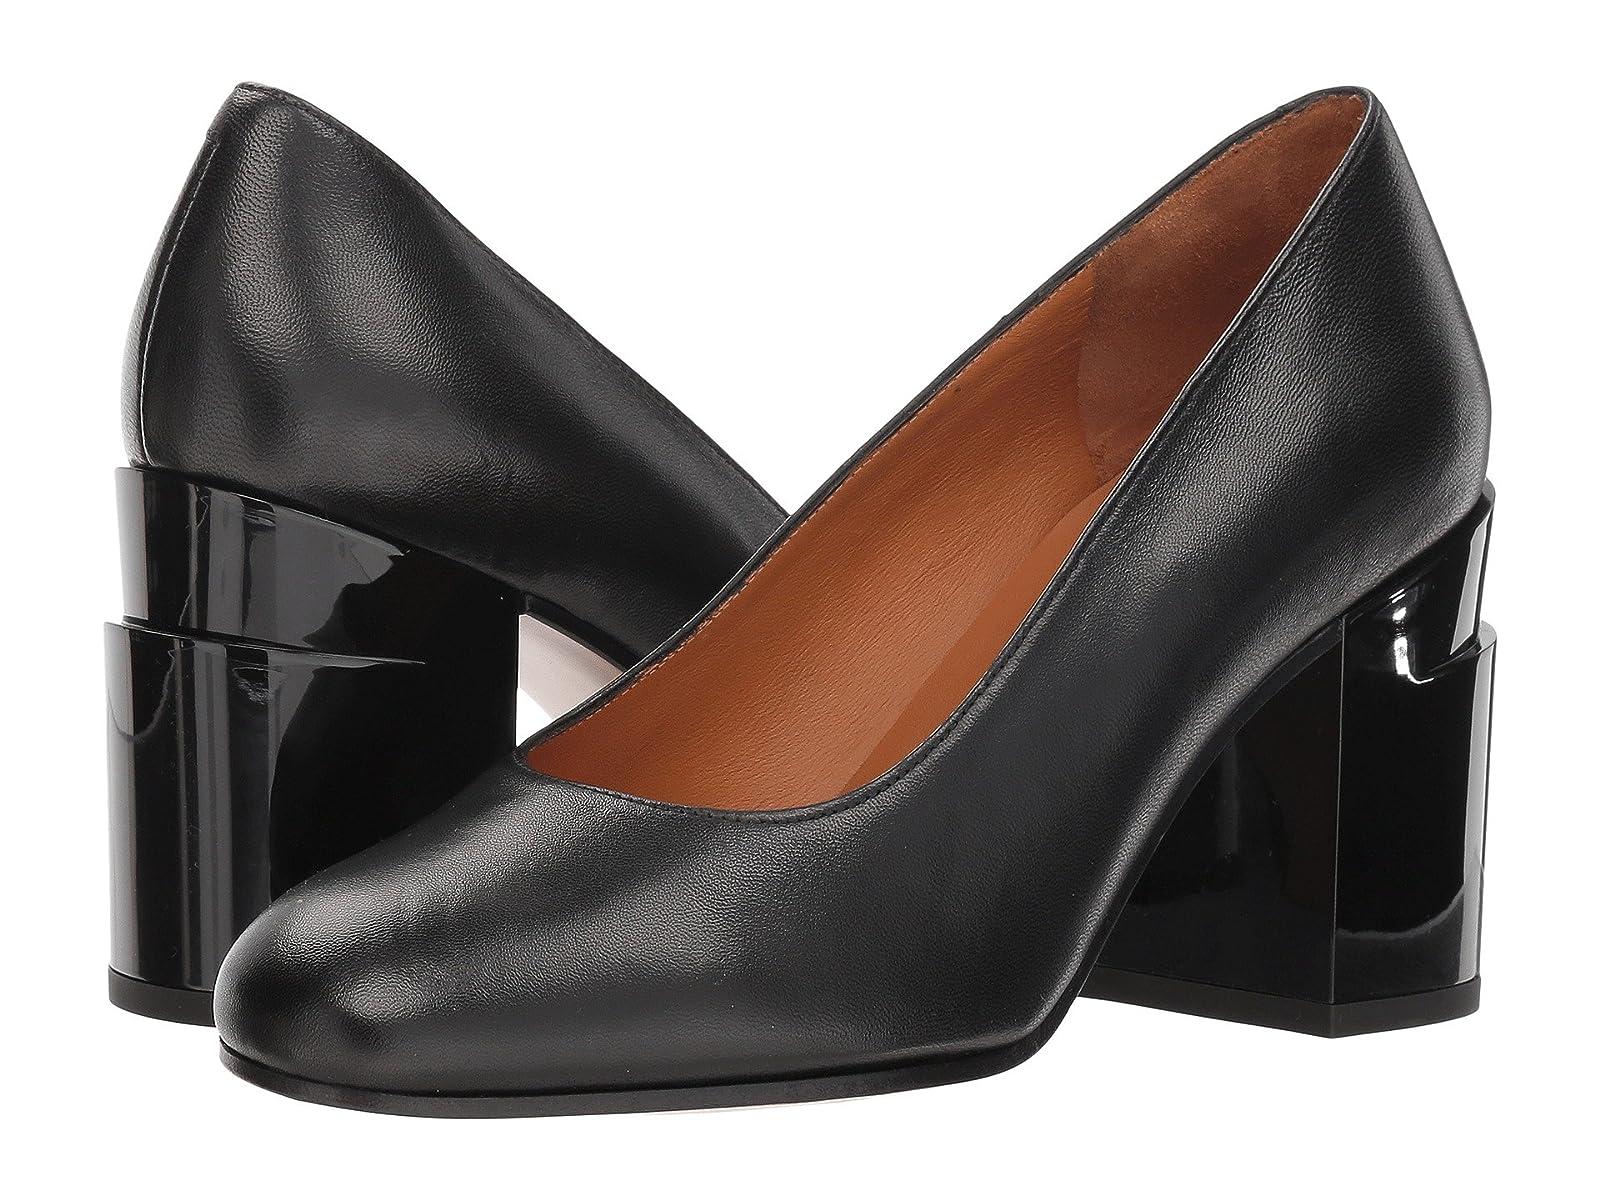 Clergerie KennethAtmospheric grades have affordable shoes